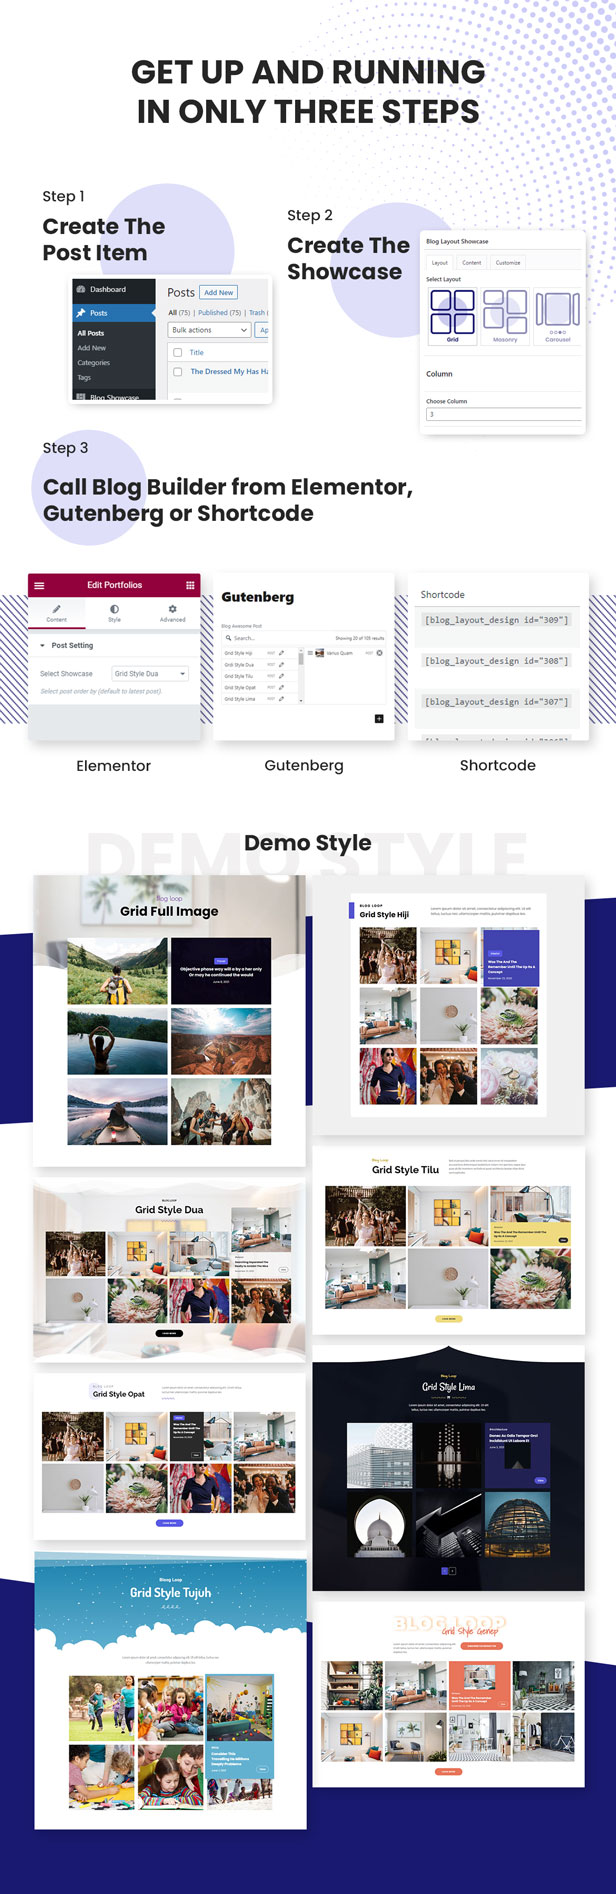 Advanced Grid Blog Layout Design - 4